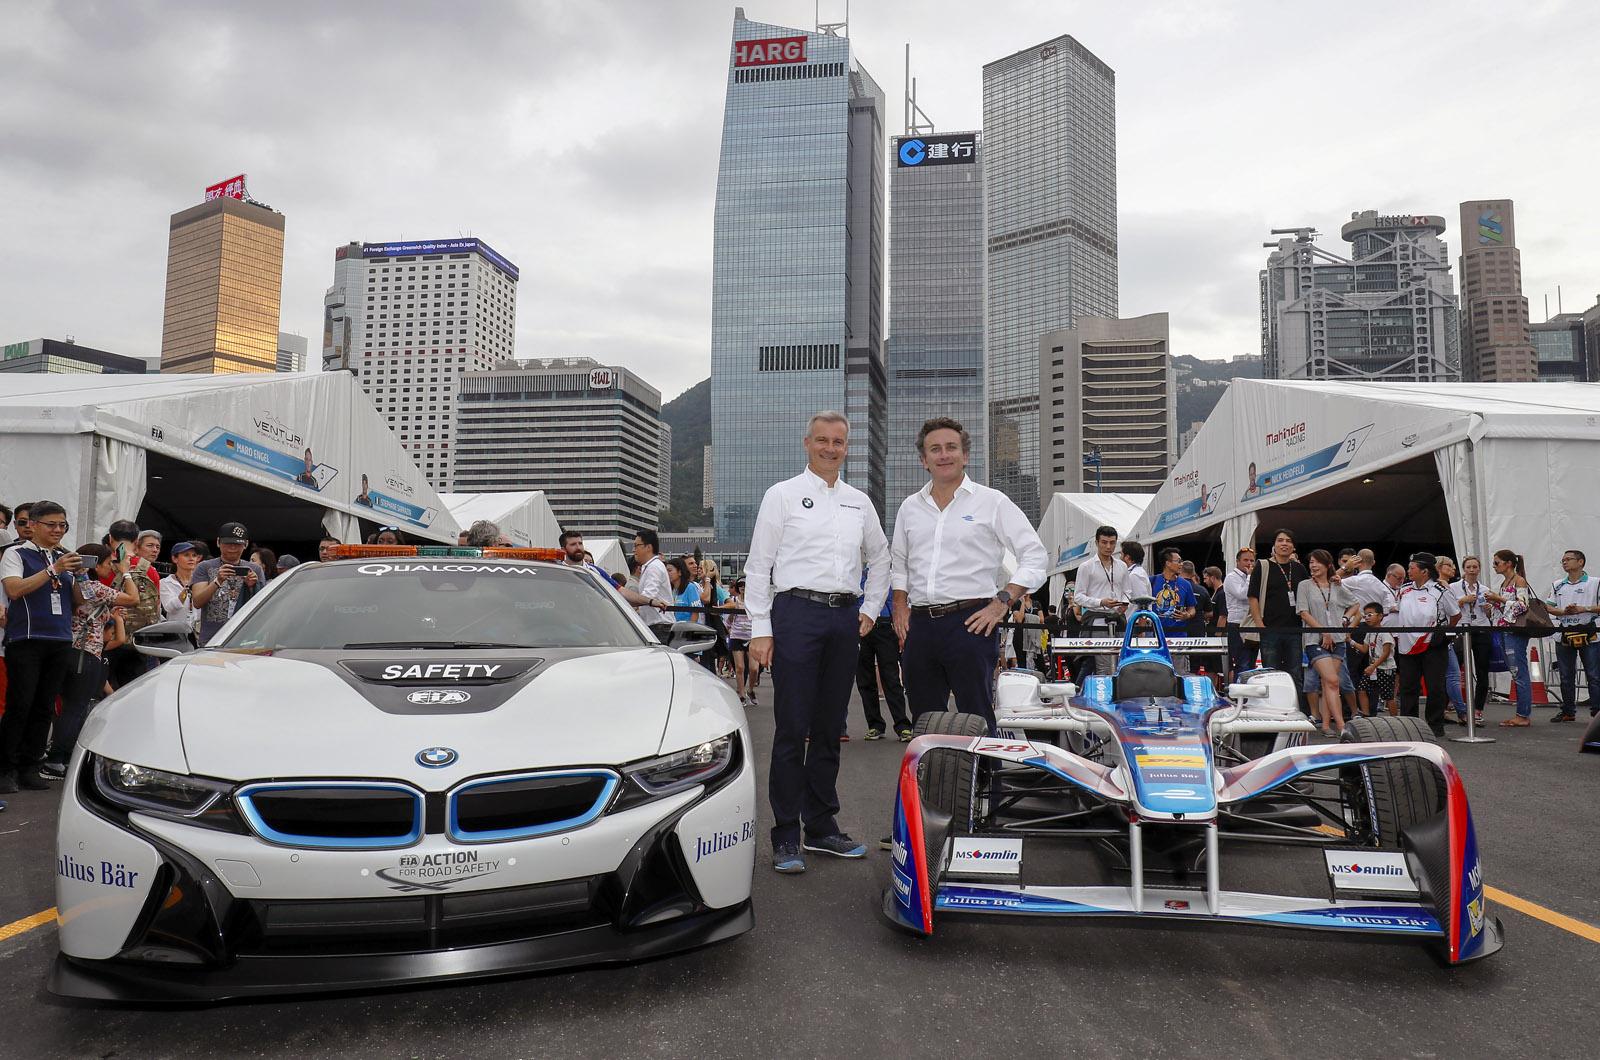 BMW сотрудничает с Andretti Autosport для входа в Формулу E